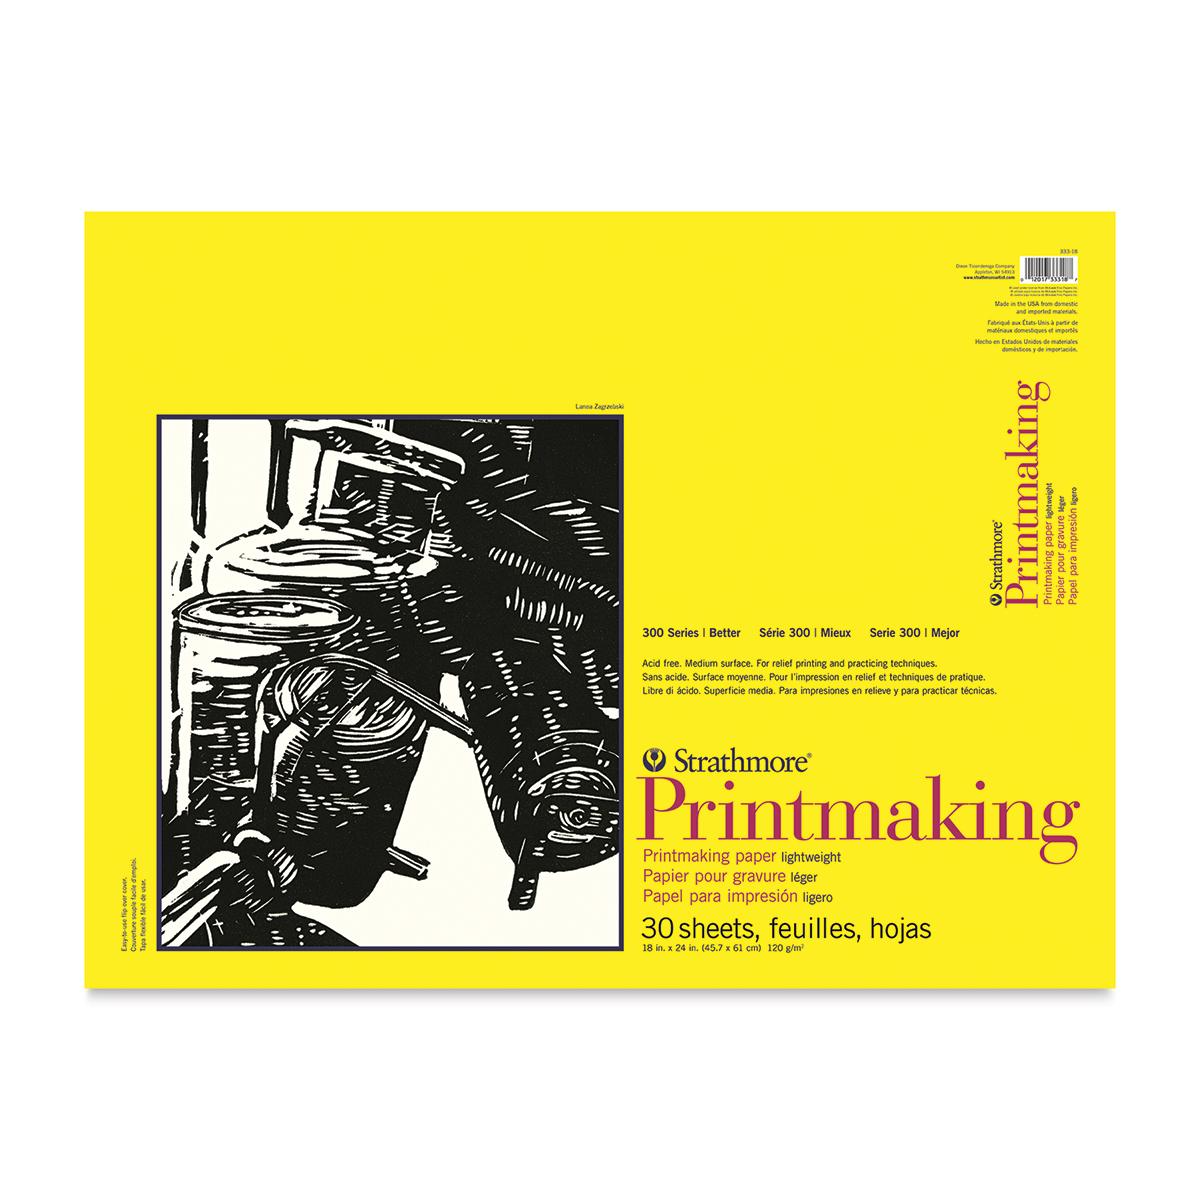 Strathmore 300 Series Printmaking Paper - 18 x 24, 30 Sheets